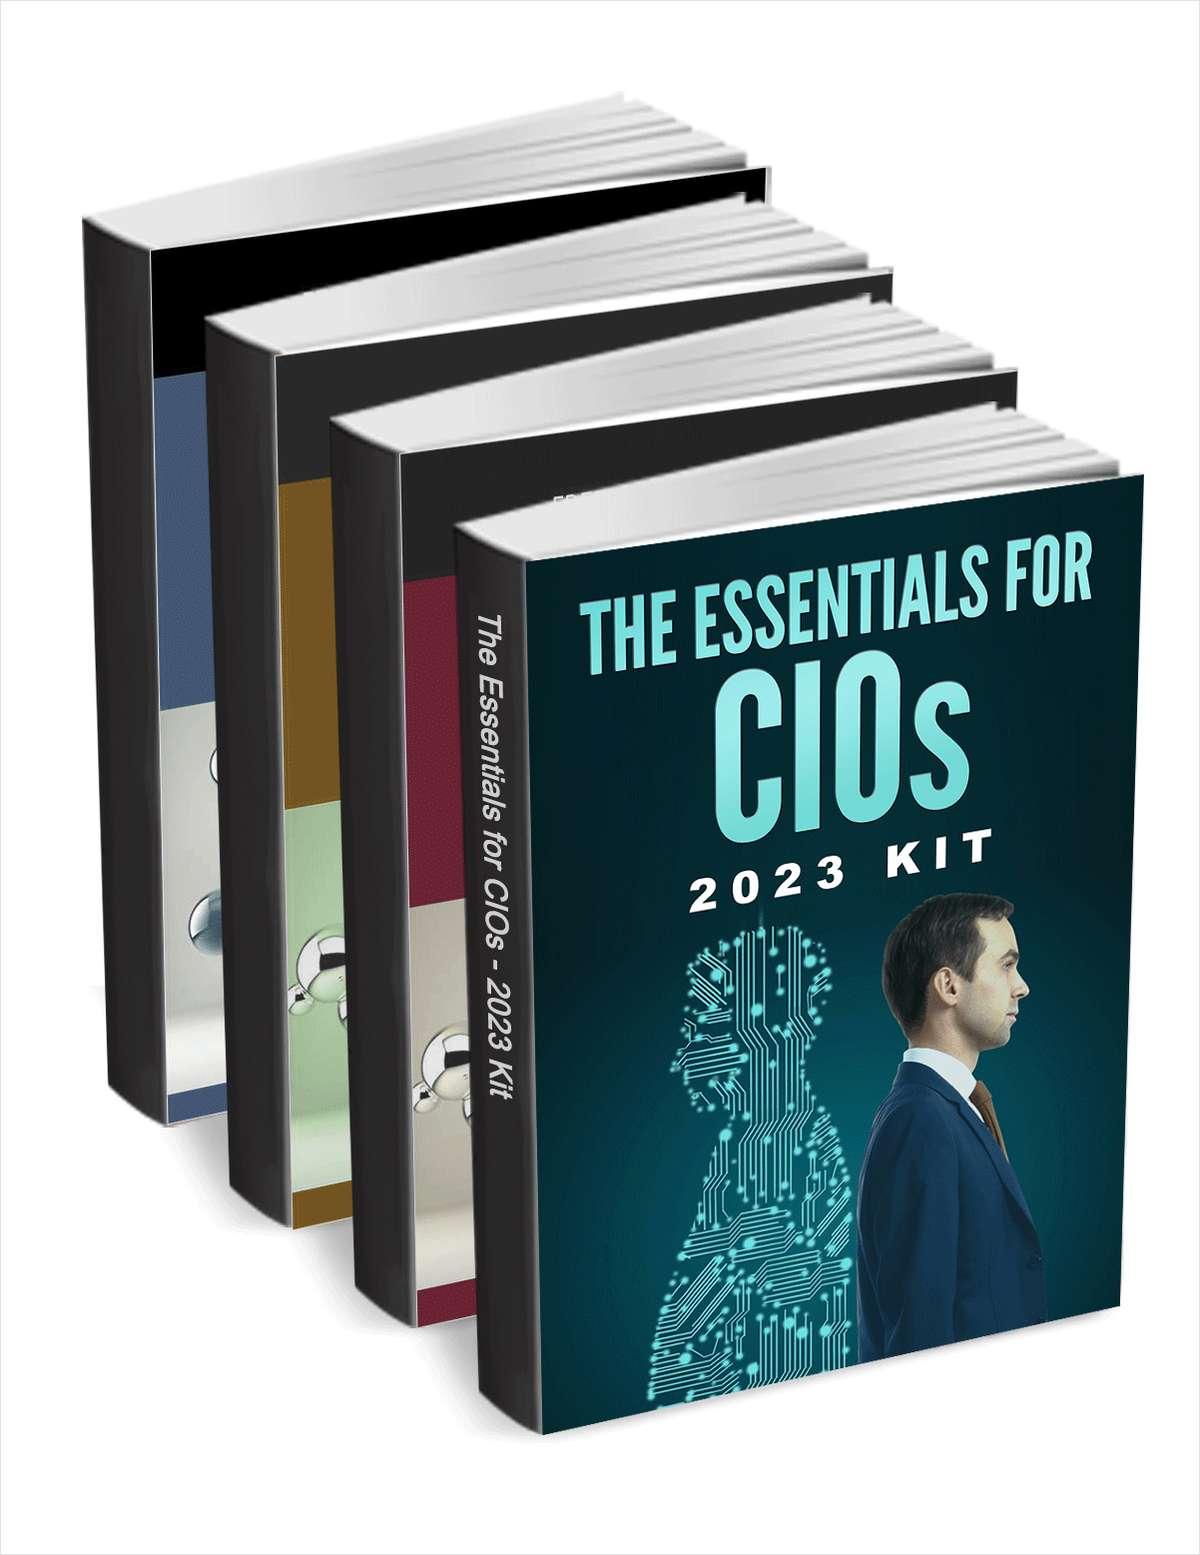 The Essentials of CIO's – Free Kit